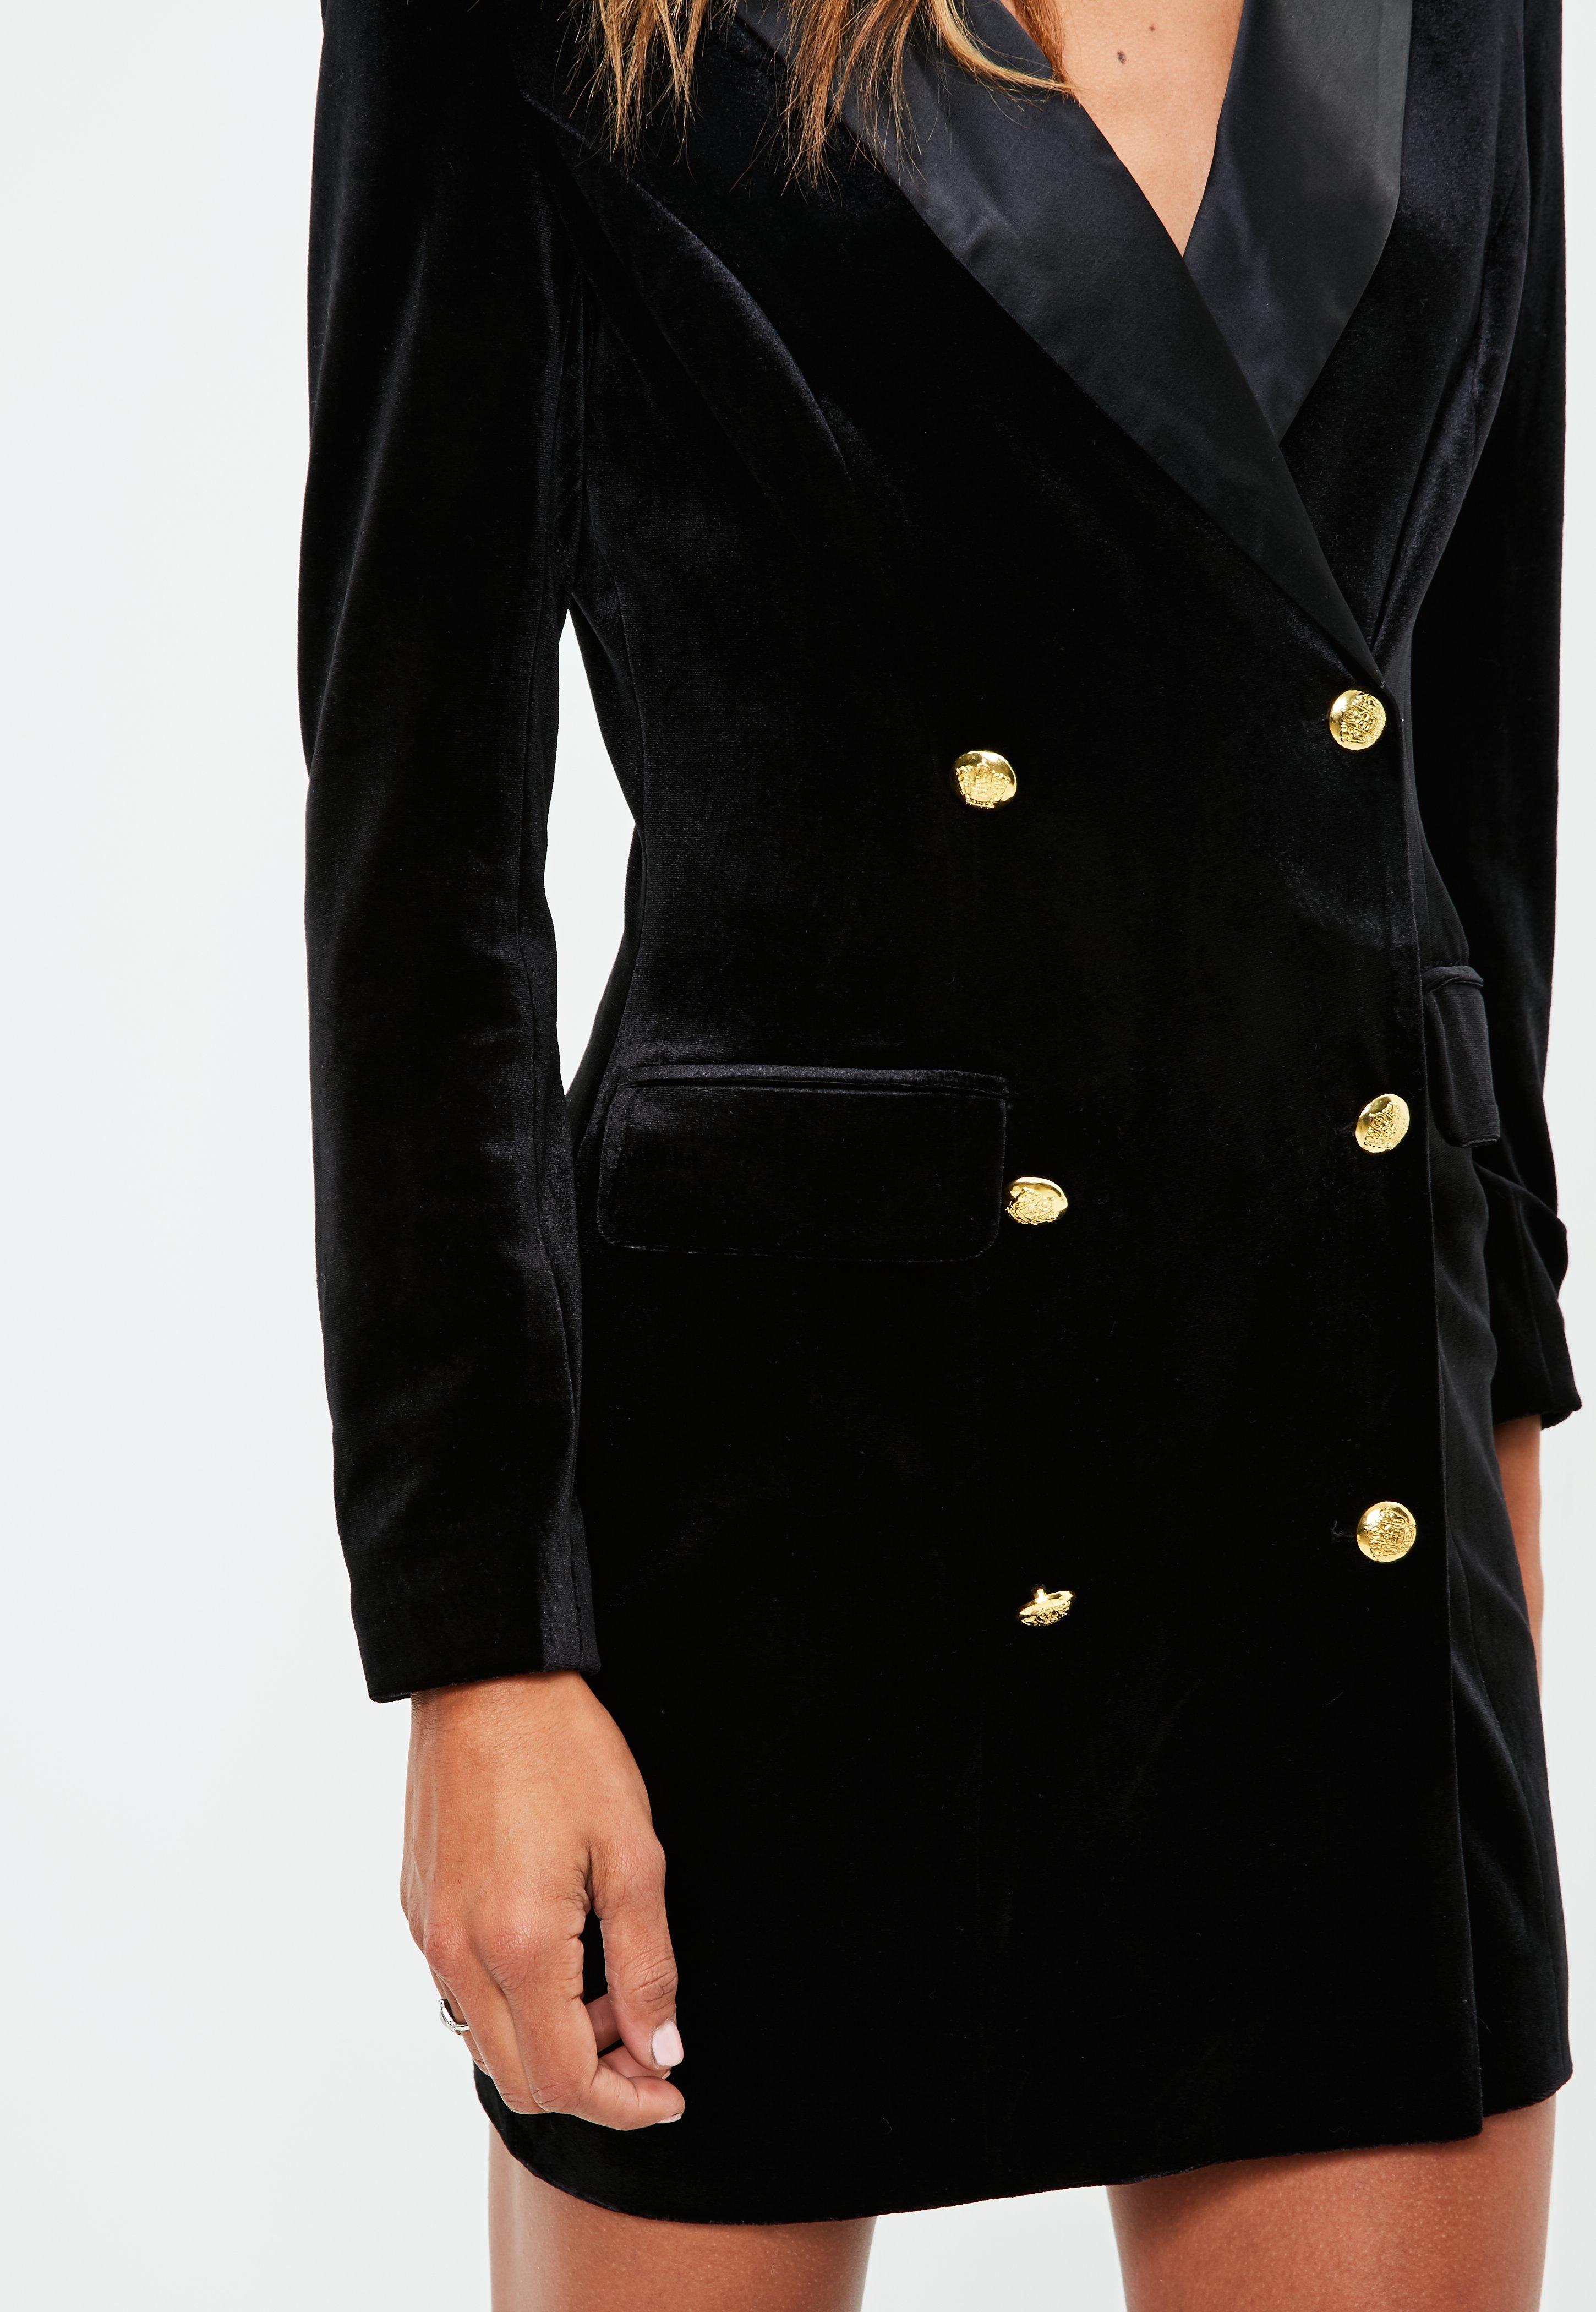 Vestido negro botones dorados